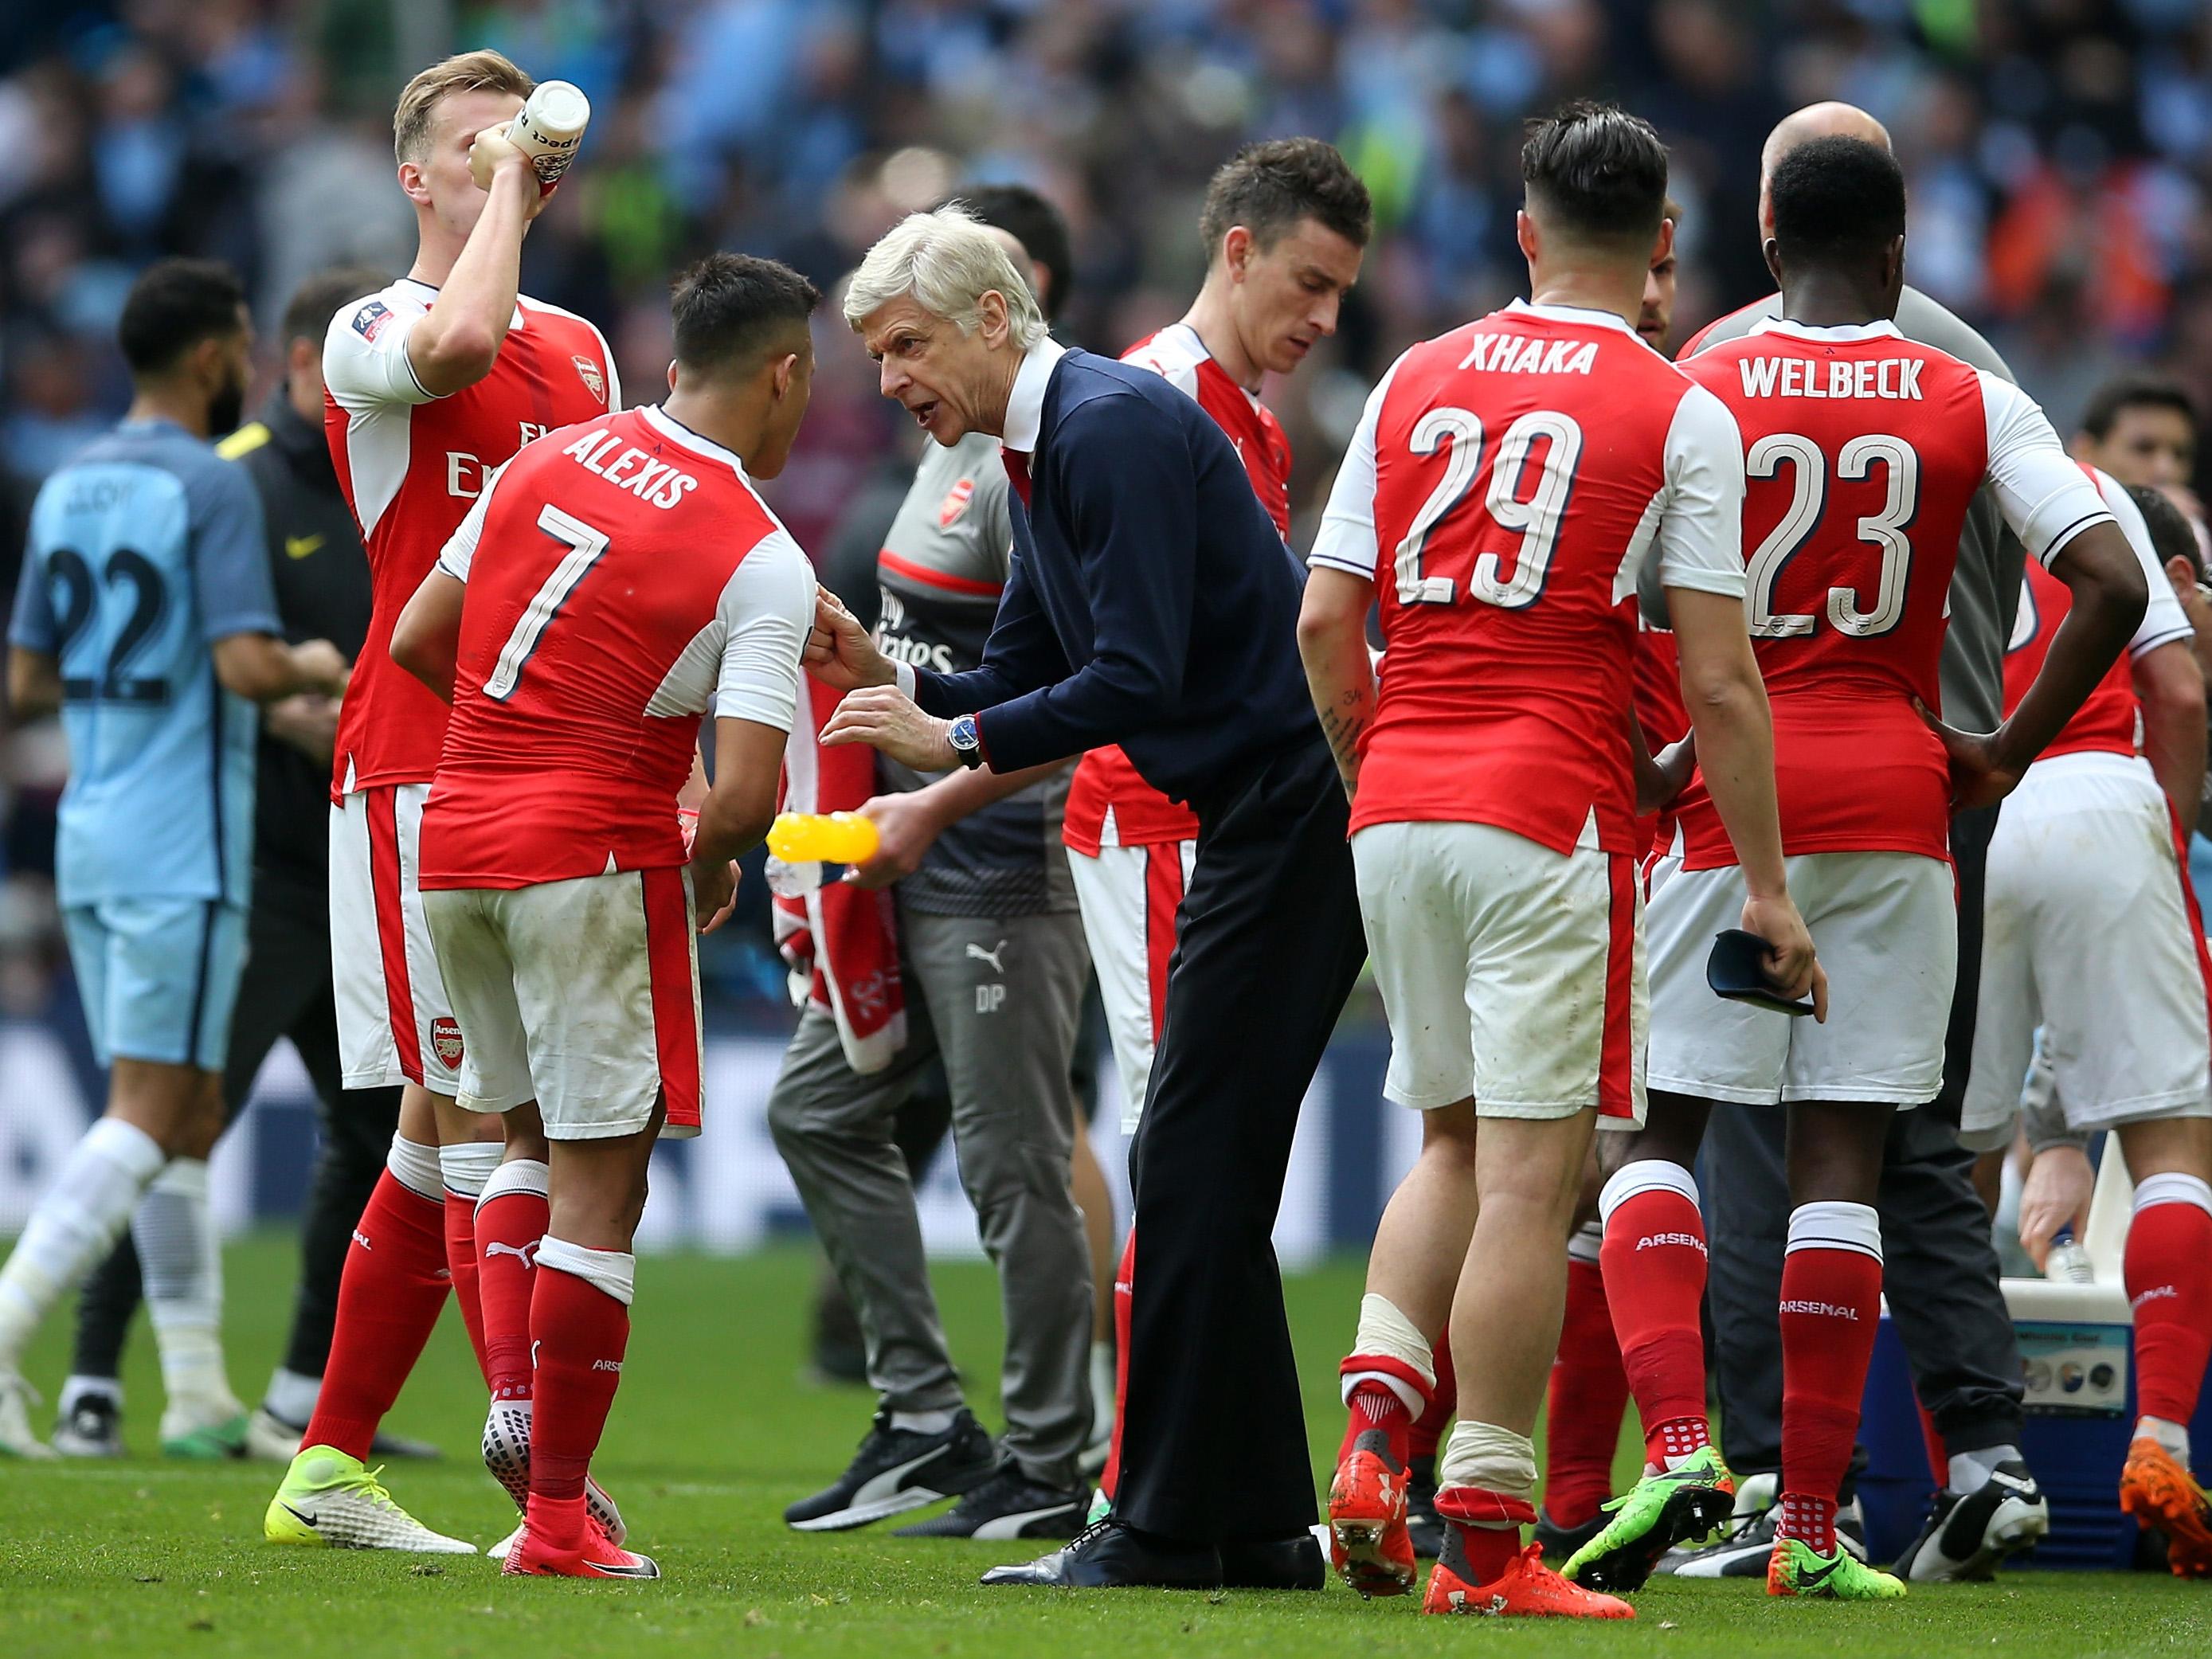 Arsenal v Manchester City – The Emirates FA Cup Semi-Final